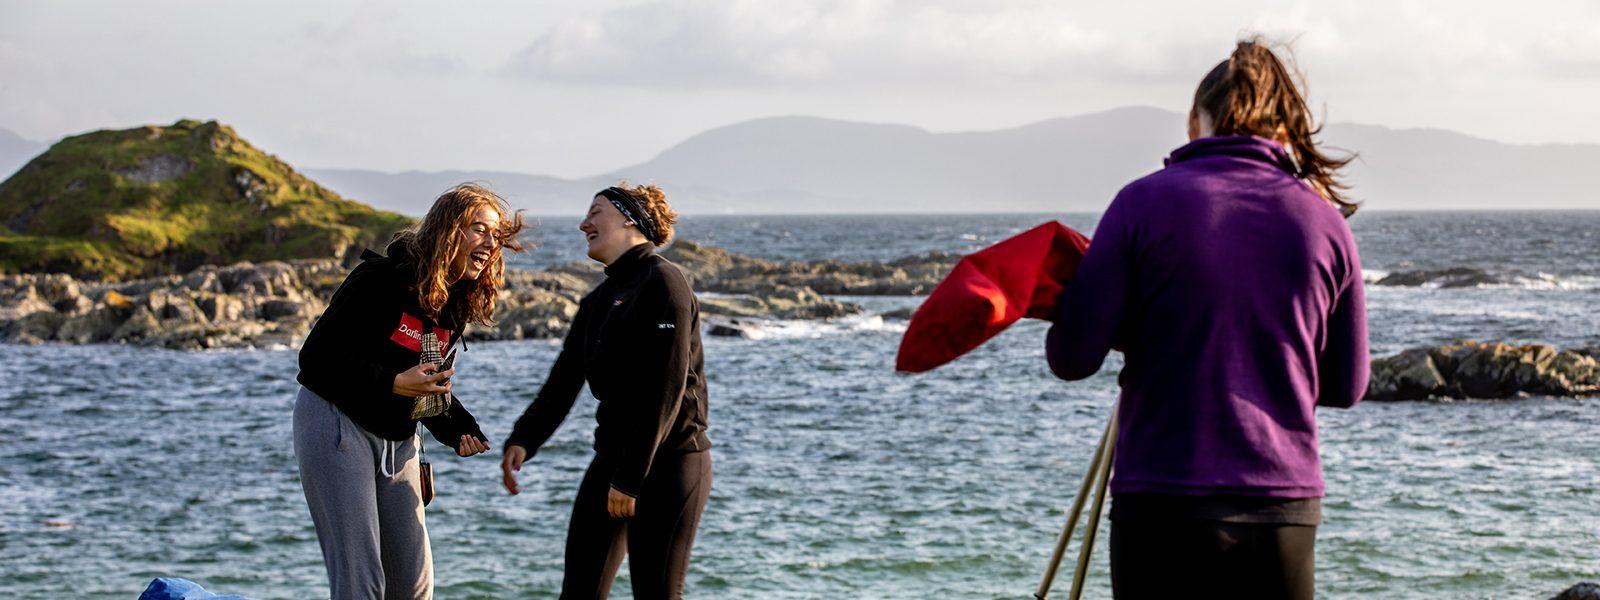 Loch eil 1600 coast exped